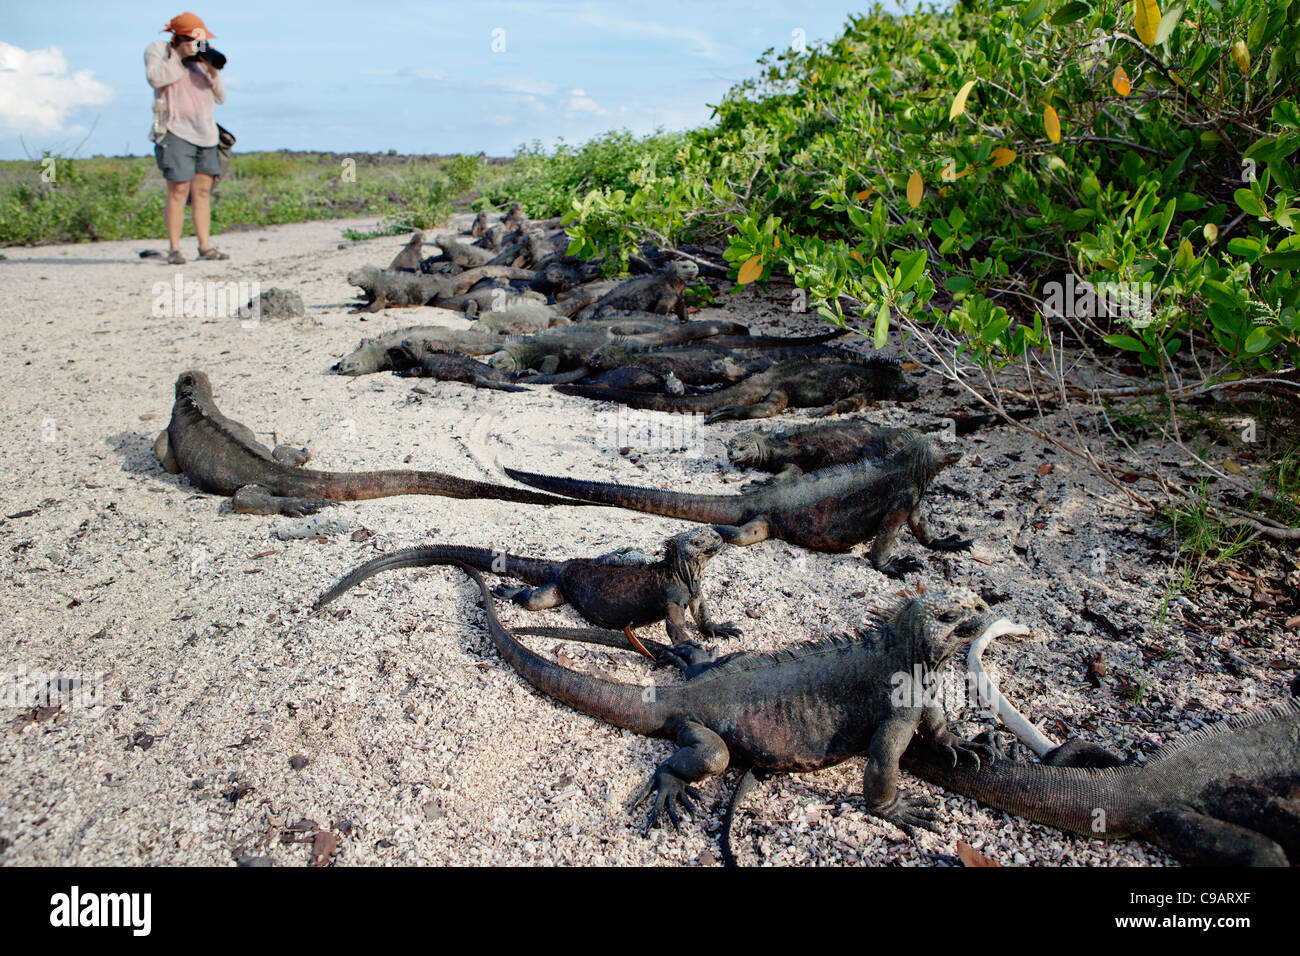 More than 60 marine iguanas in Tortuga Beach on Santa Cruz island, Galapagos, Ecuador. - Stock Image